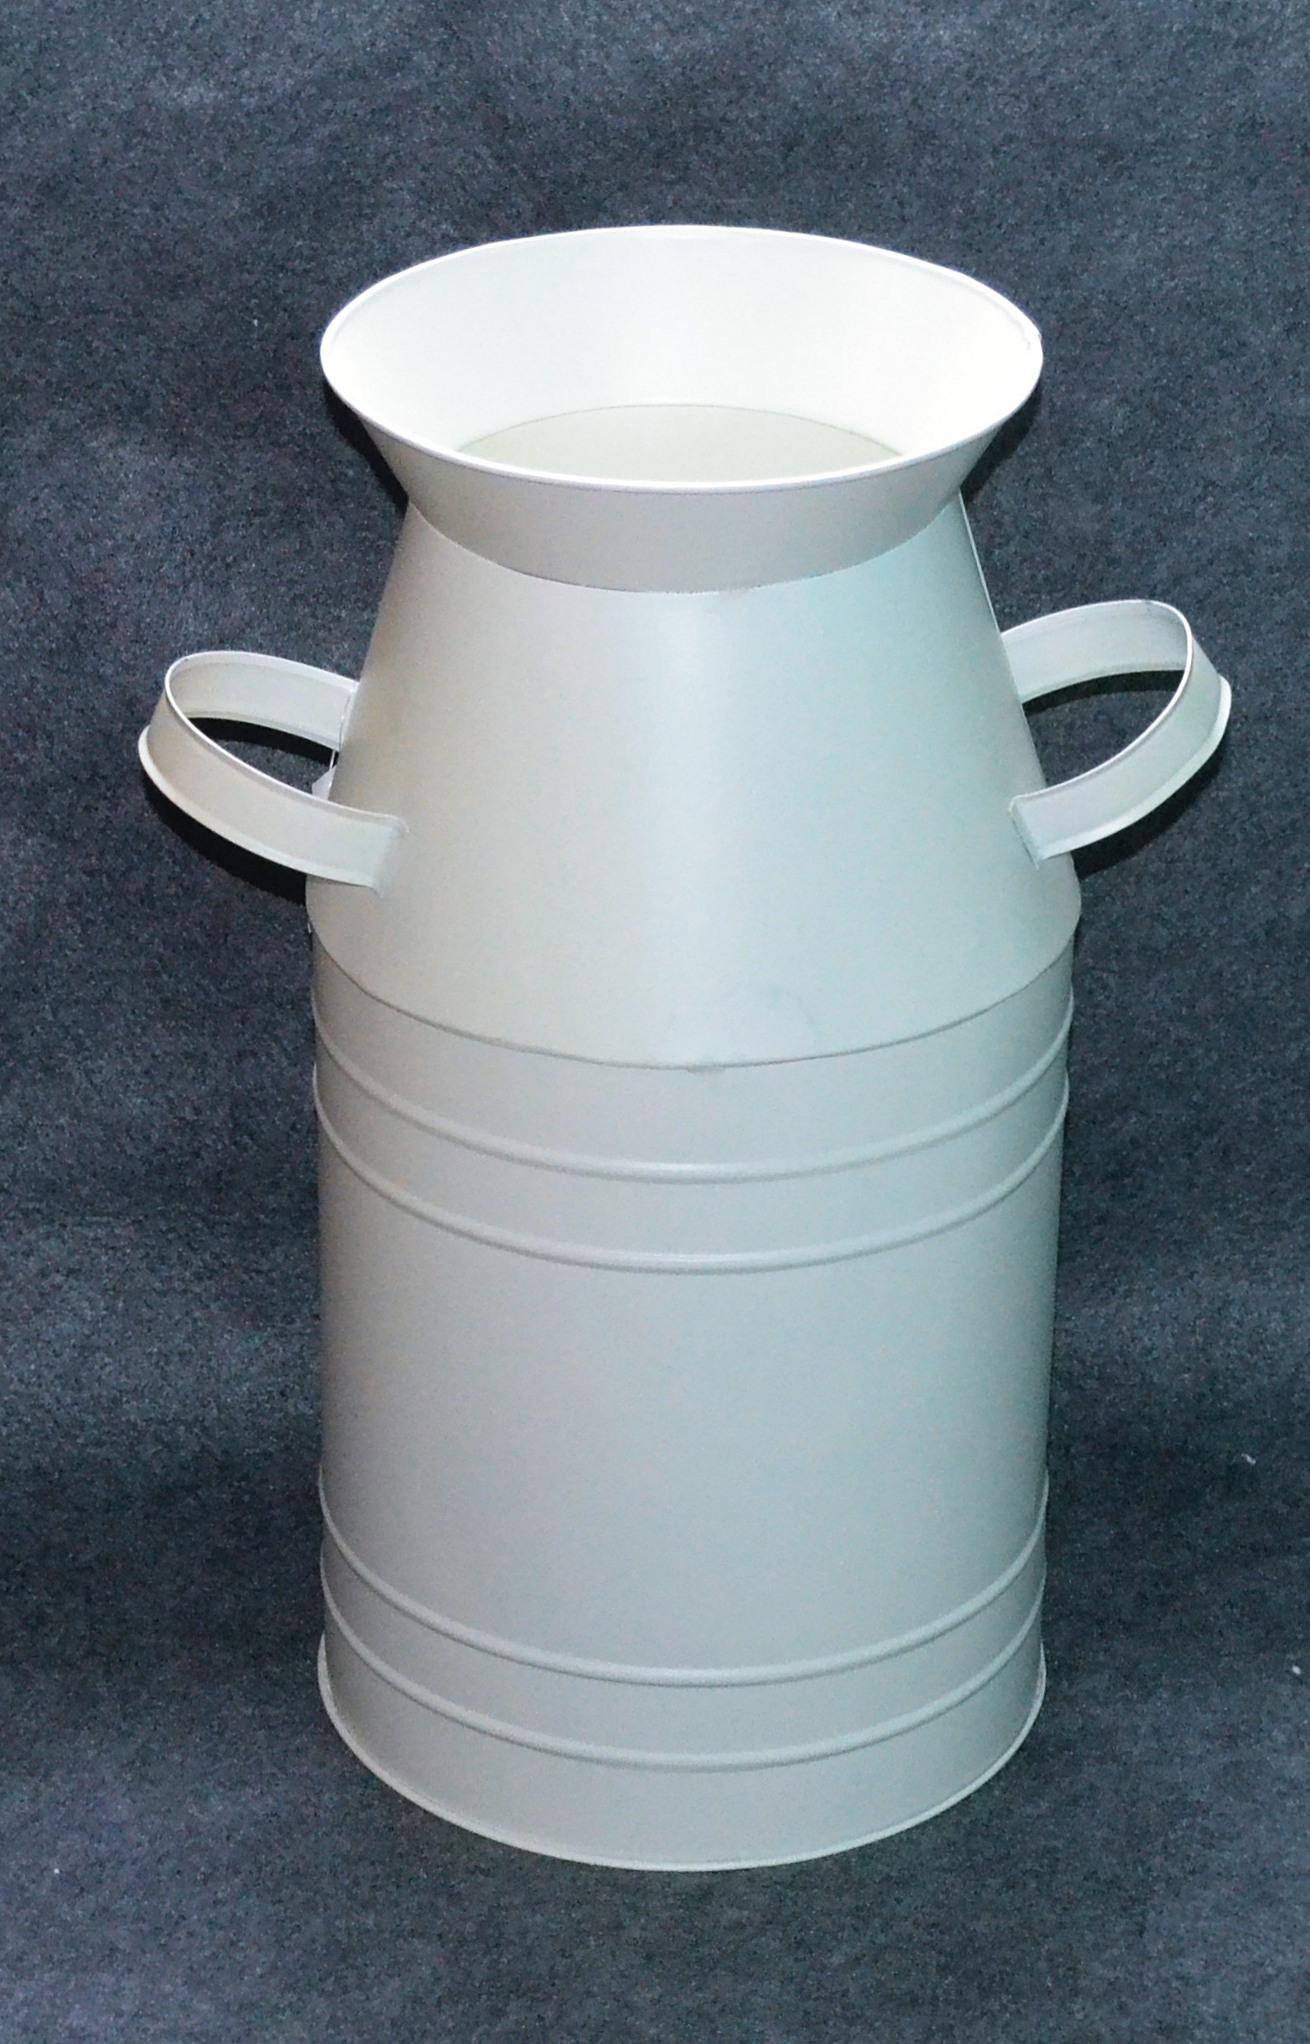 metal-milk-can-white-18x9-mc32195.jpg